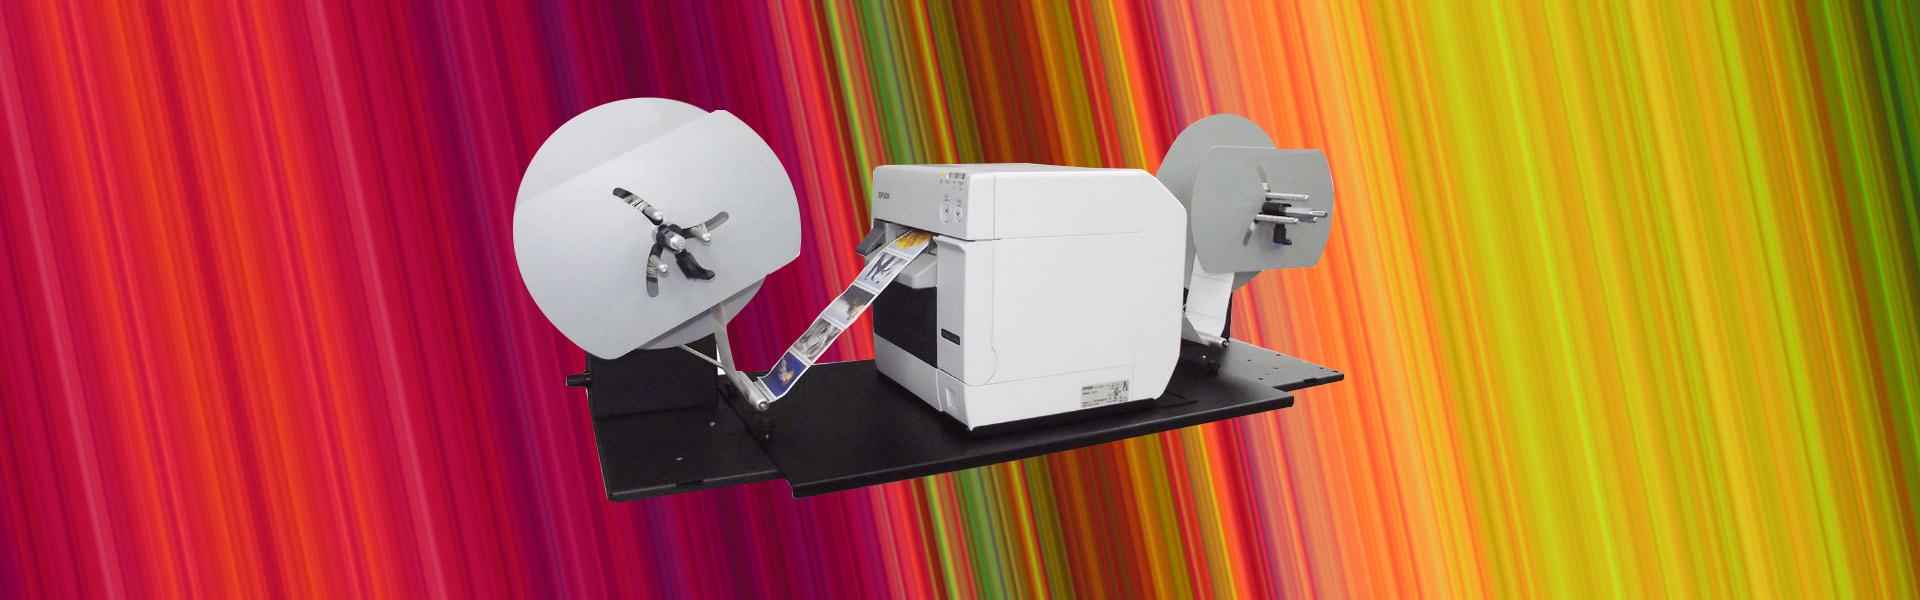 Digitaler Etikettendrucker PRINTUS C100